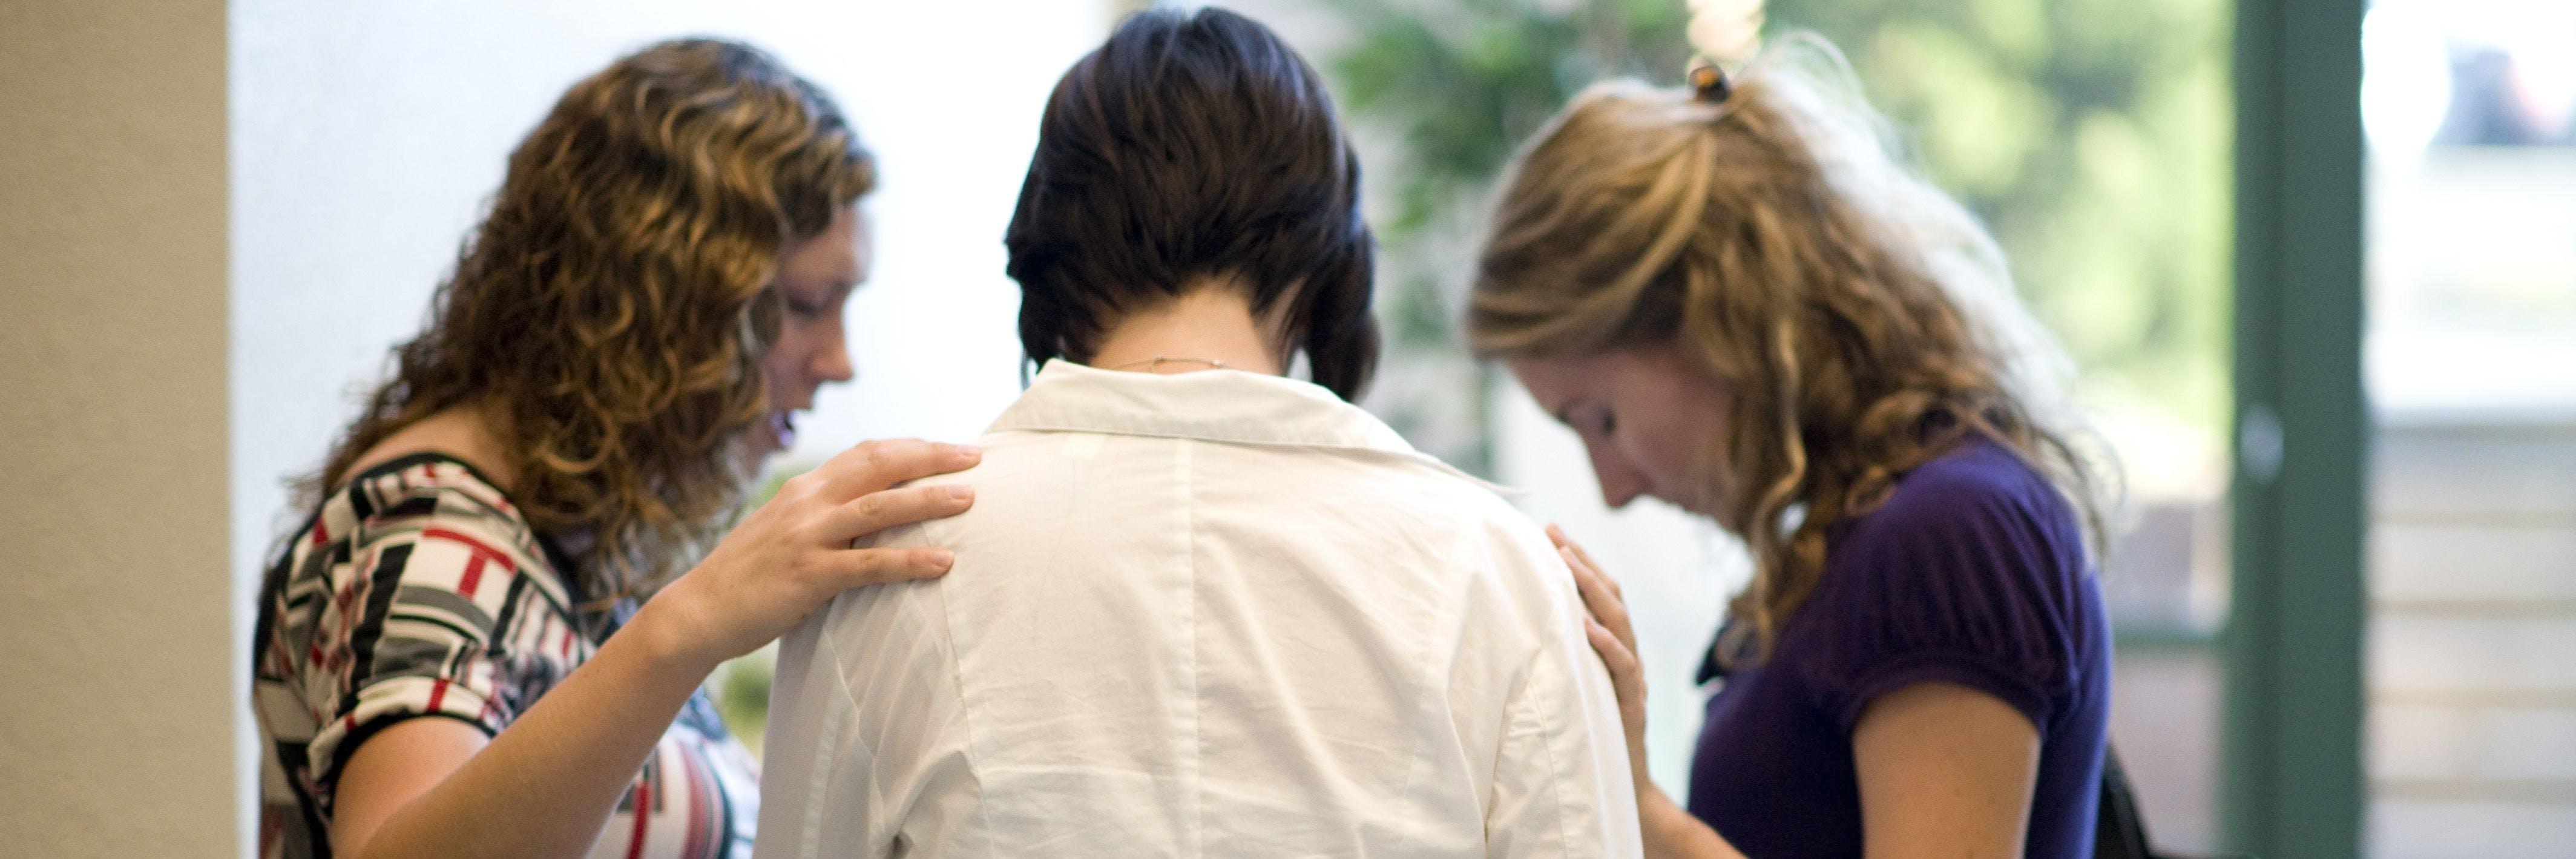 Seminary students praying